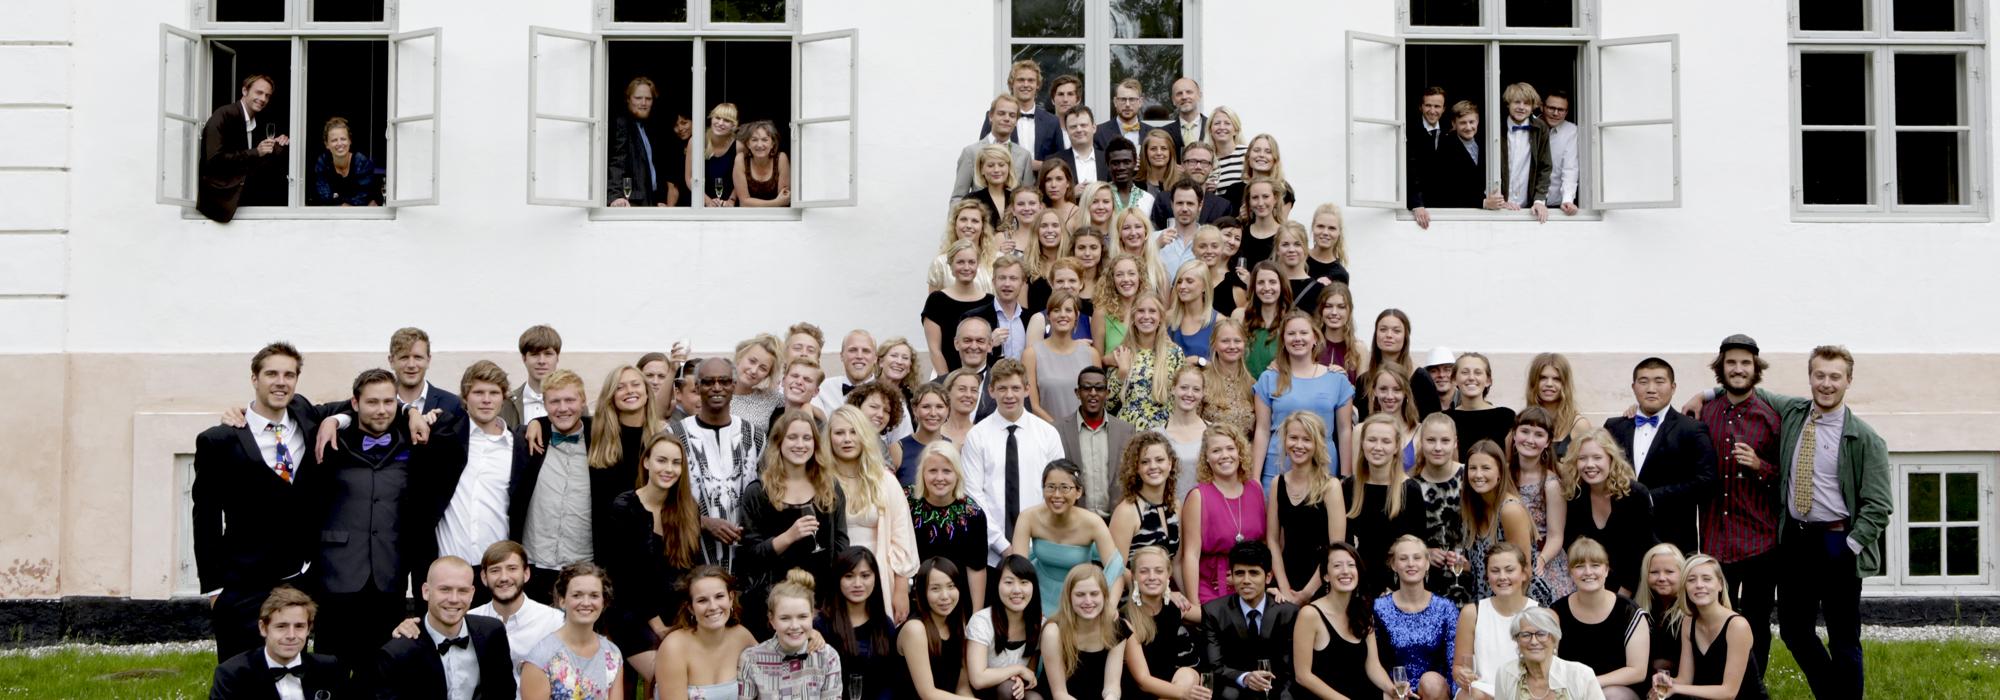 Folk på Krogerup